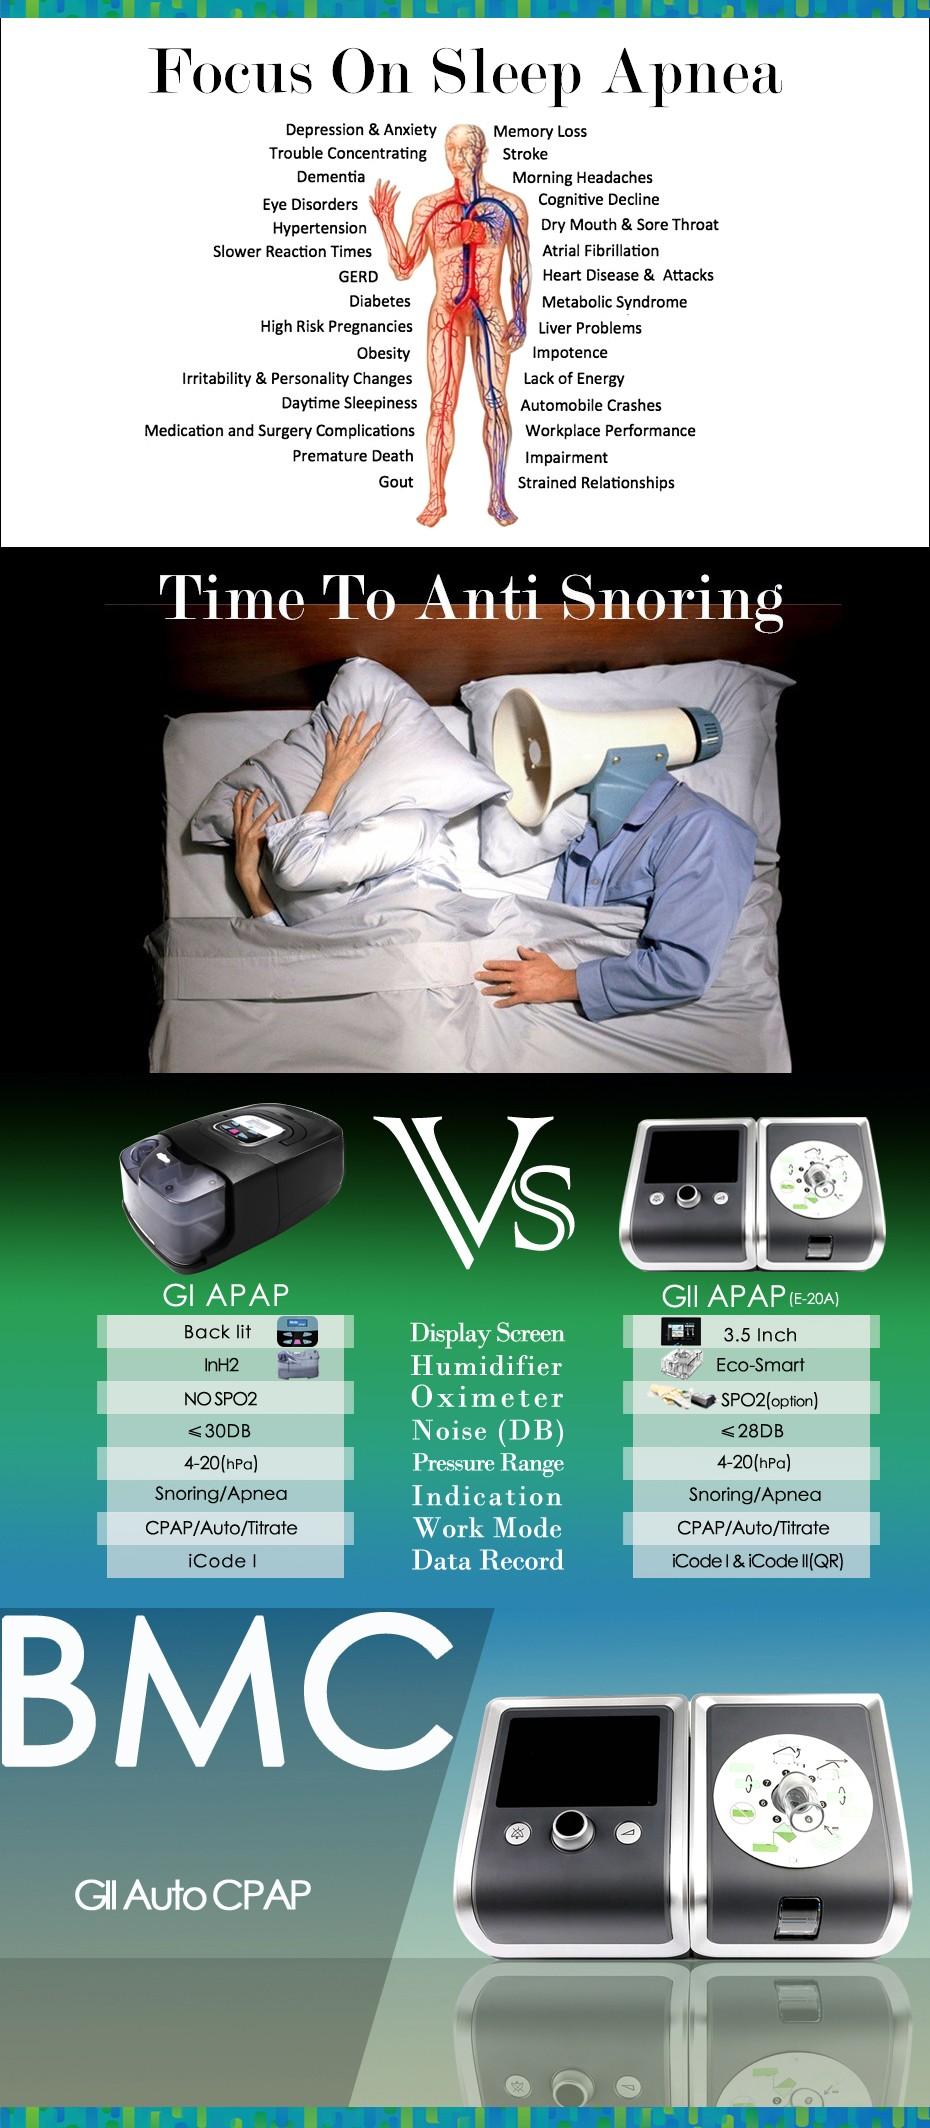 Doctodd GII Auto CPAP E-20A-O APAP Machine For Snoring Therapy Anti Snoring Sleep Apnea OSAHS OSAS APAP With Mask S M L Size (9)